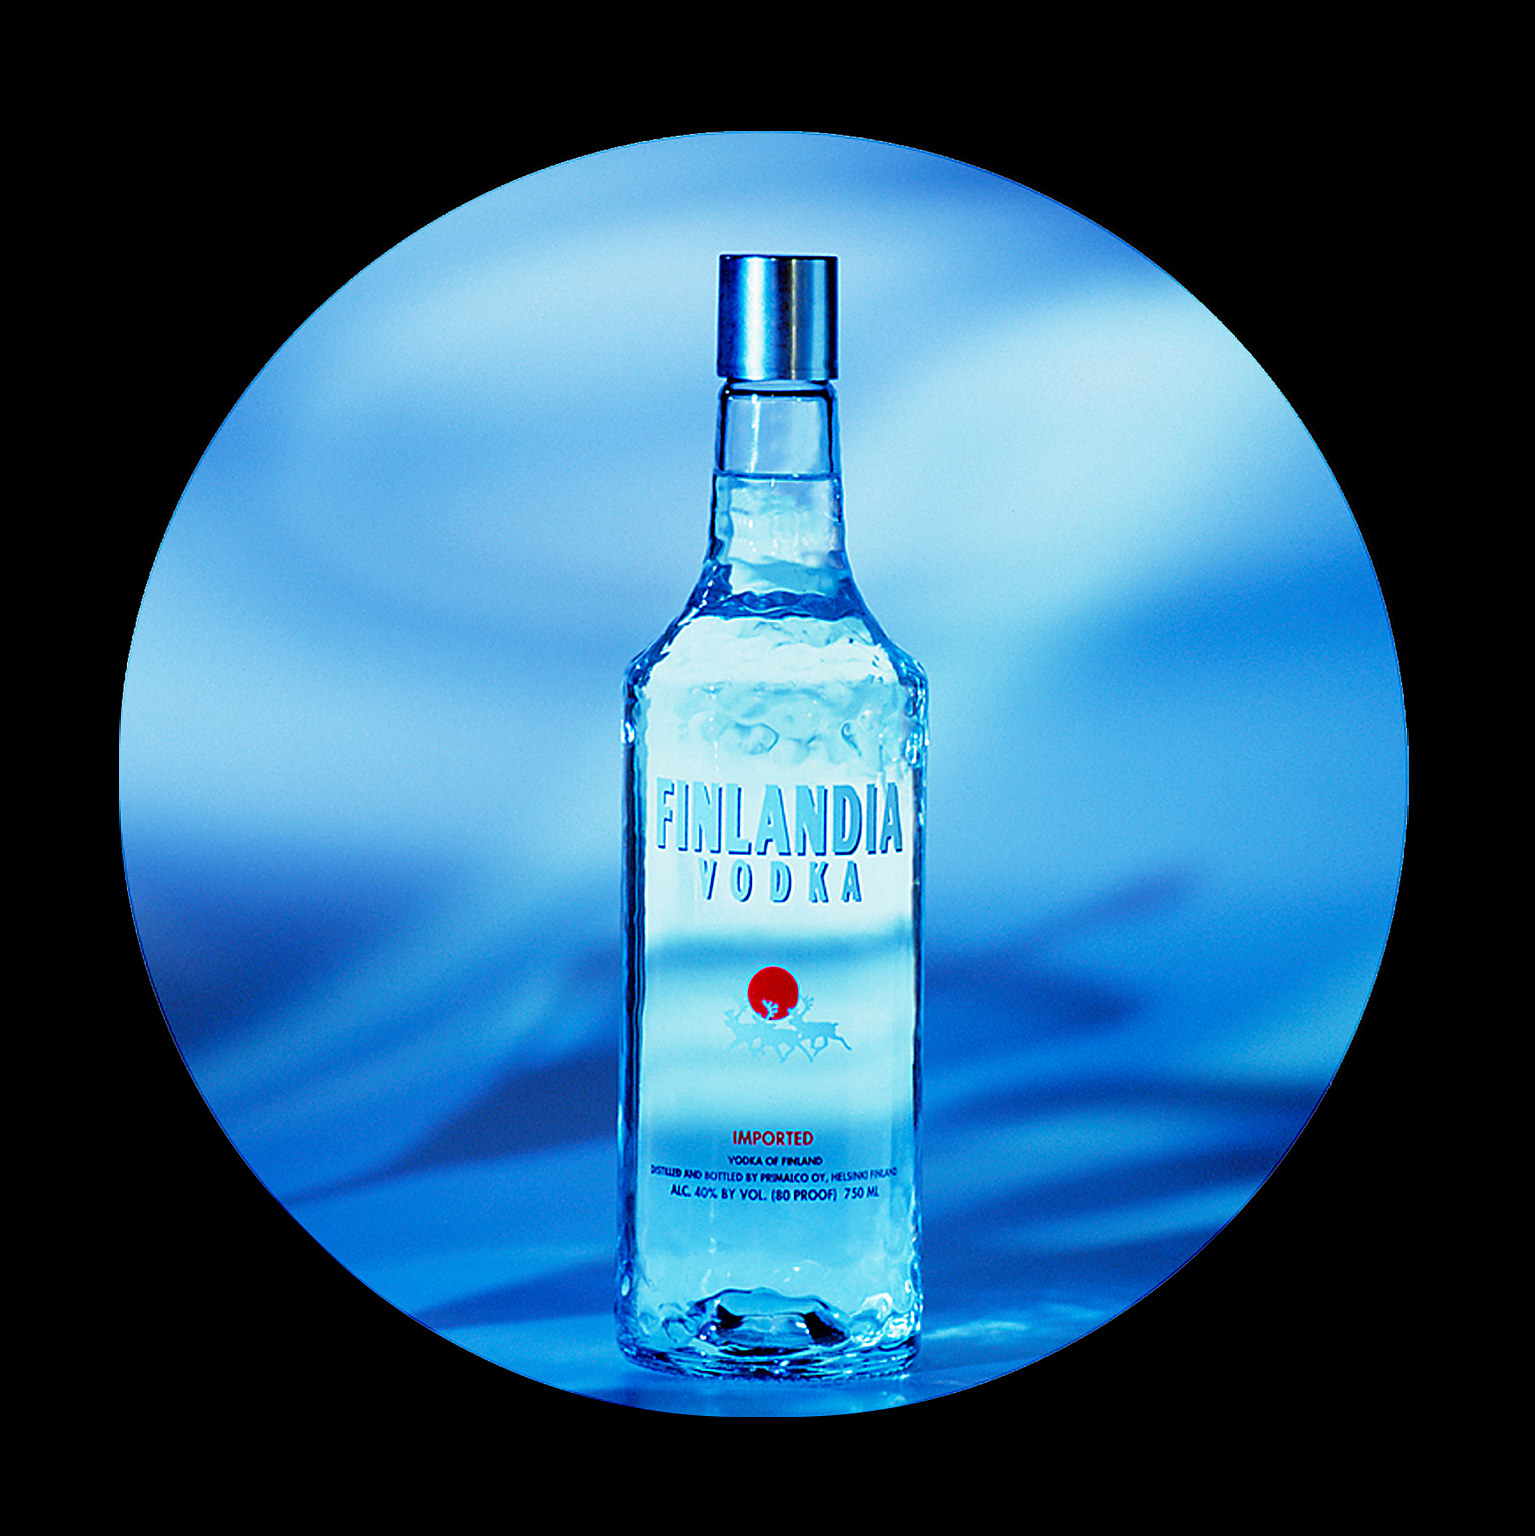 Product photo of Finlandia vodka bottle